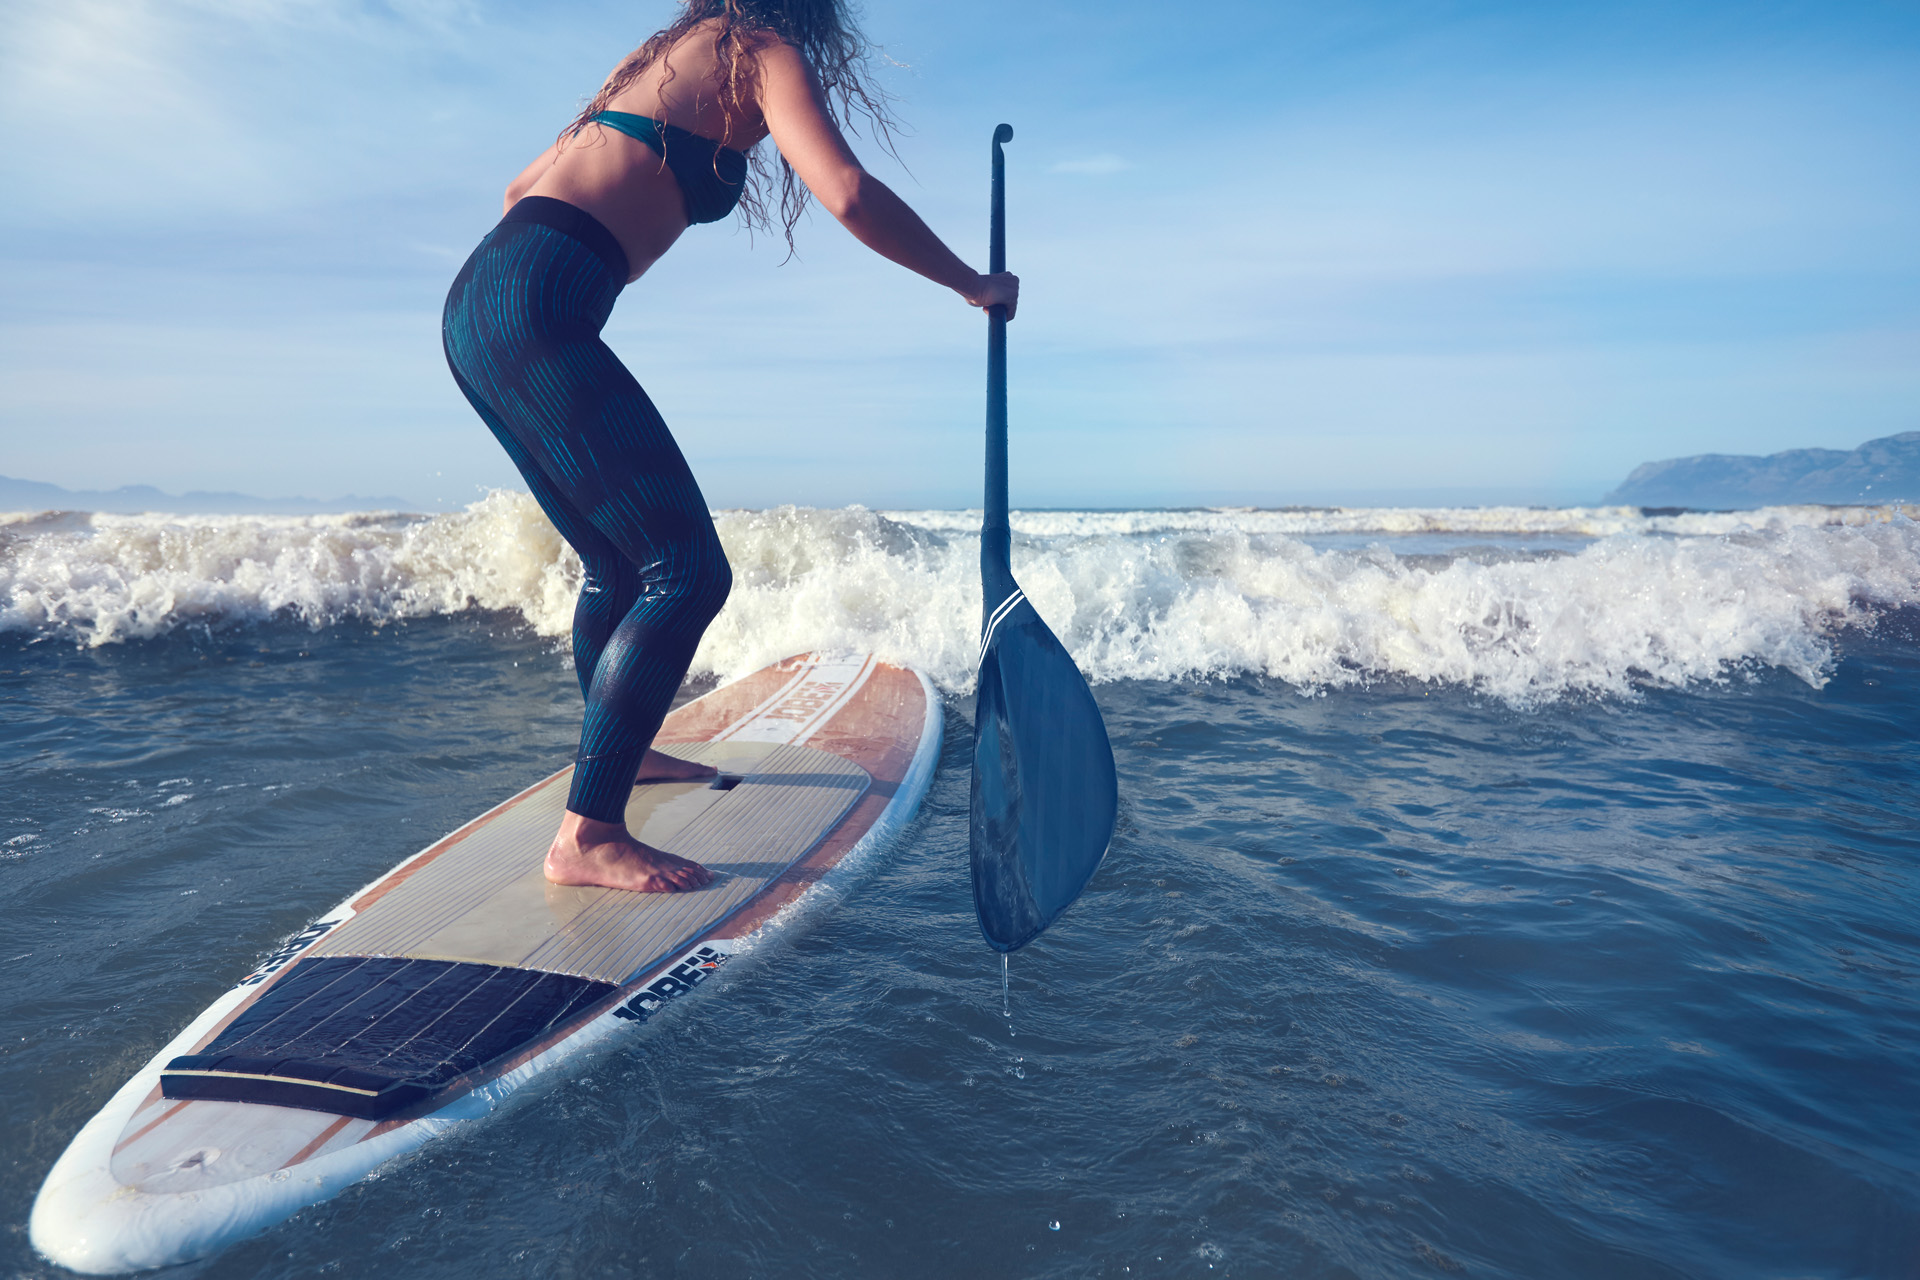 Доска для серфинга своими руками фото 887